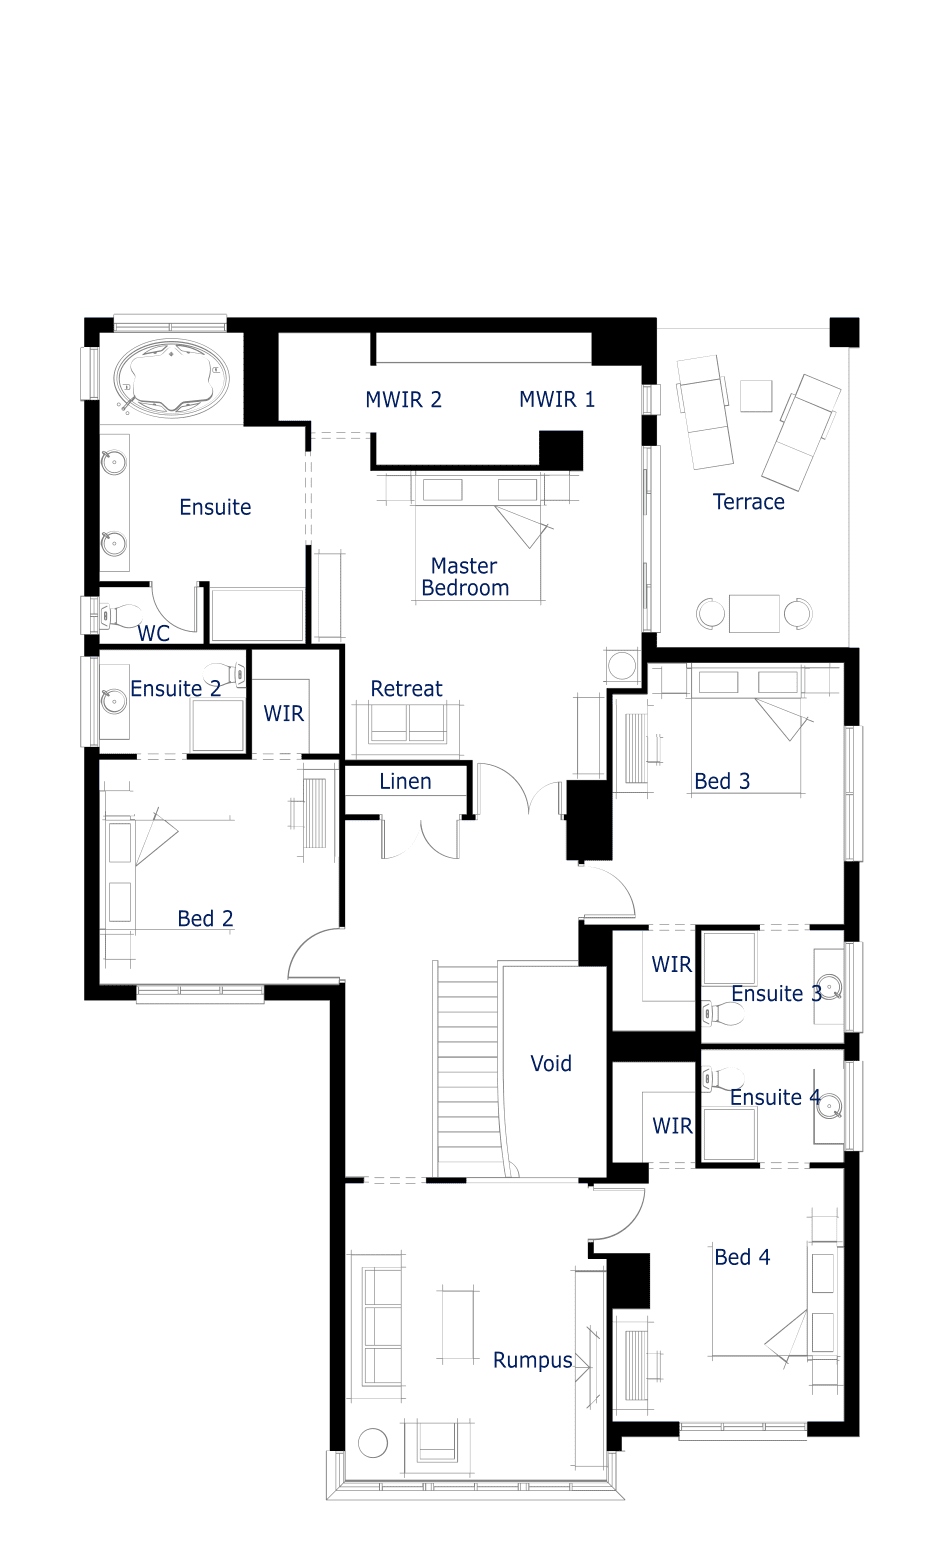 FloorPlan2_HOUSE380_Waldorf_48-02